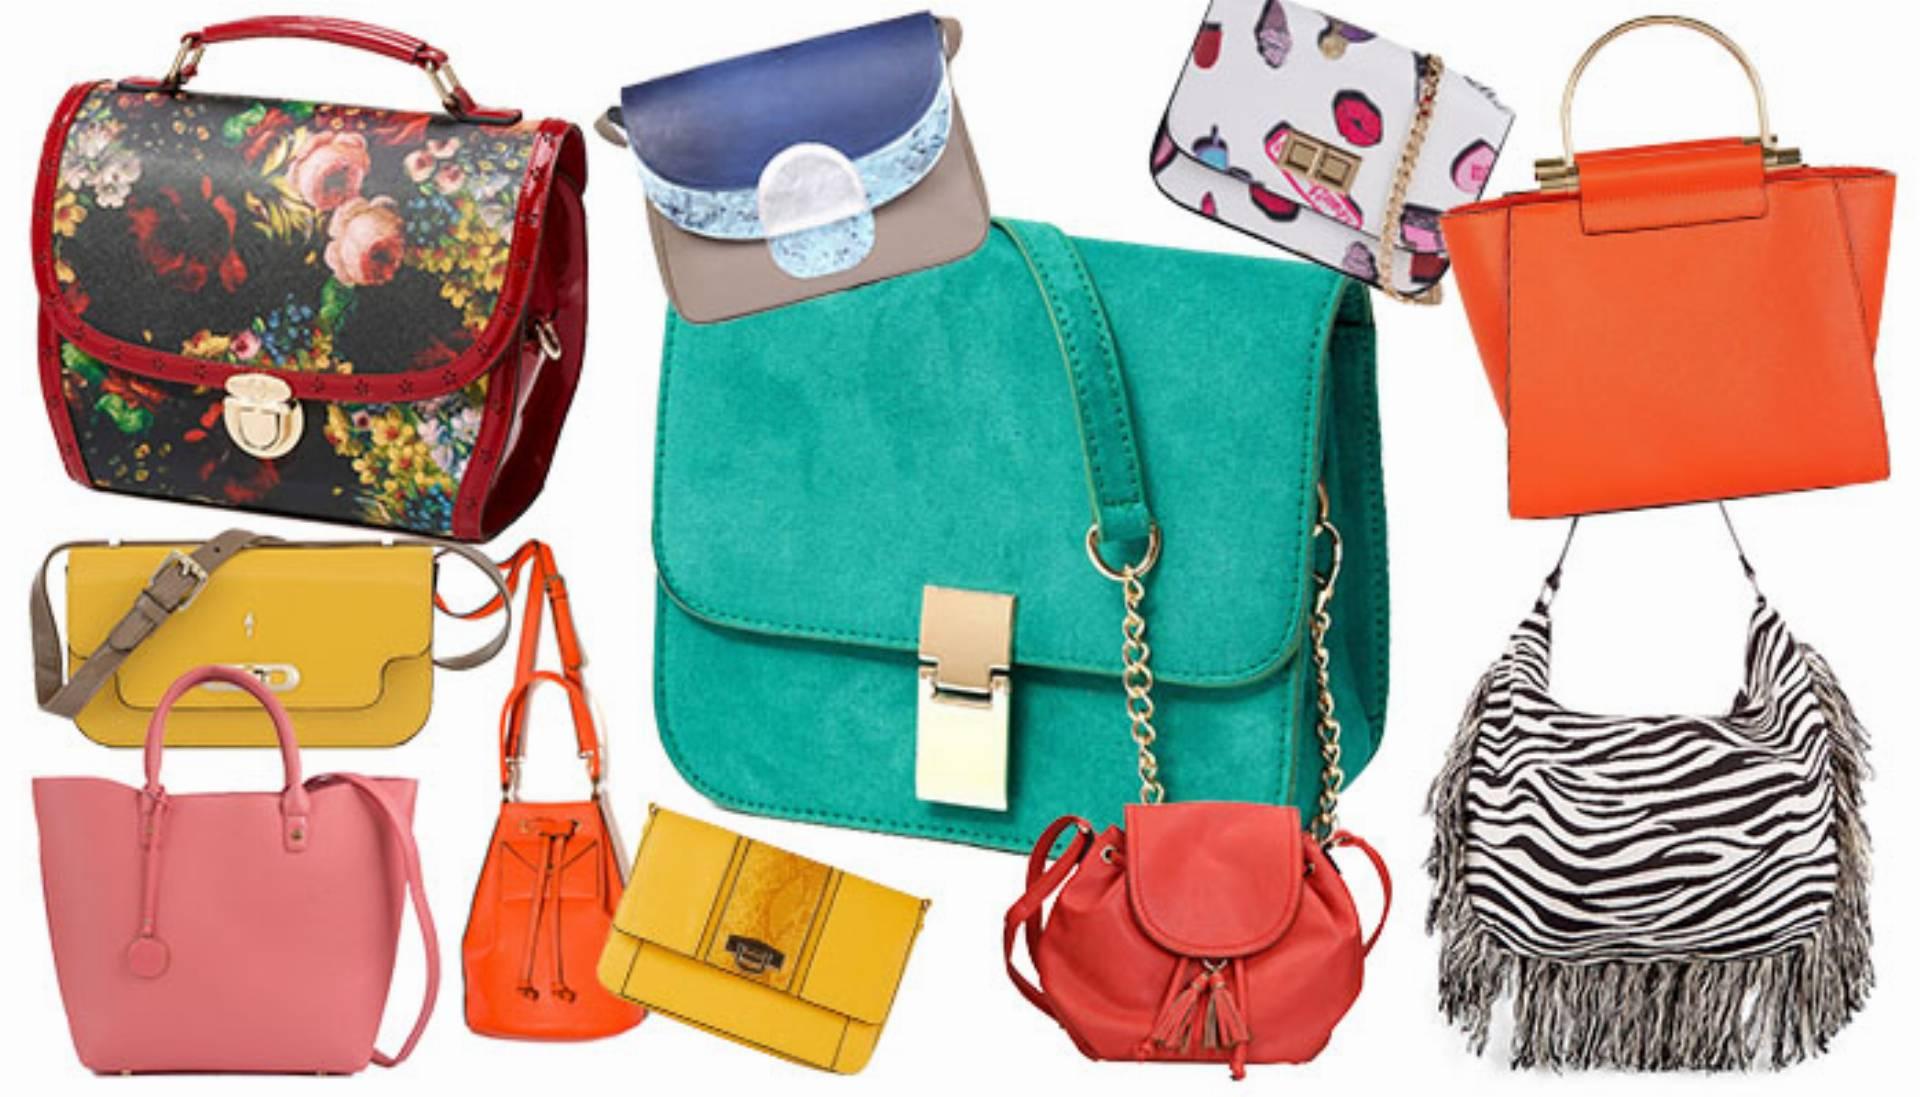 a0e7d19db5948 Shoppingowy przegląd  Modne torebki na wiosnę 2016 - KobietaMag.pl